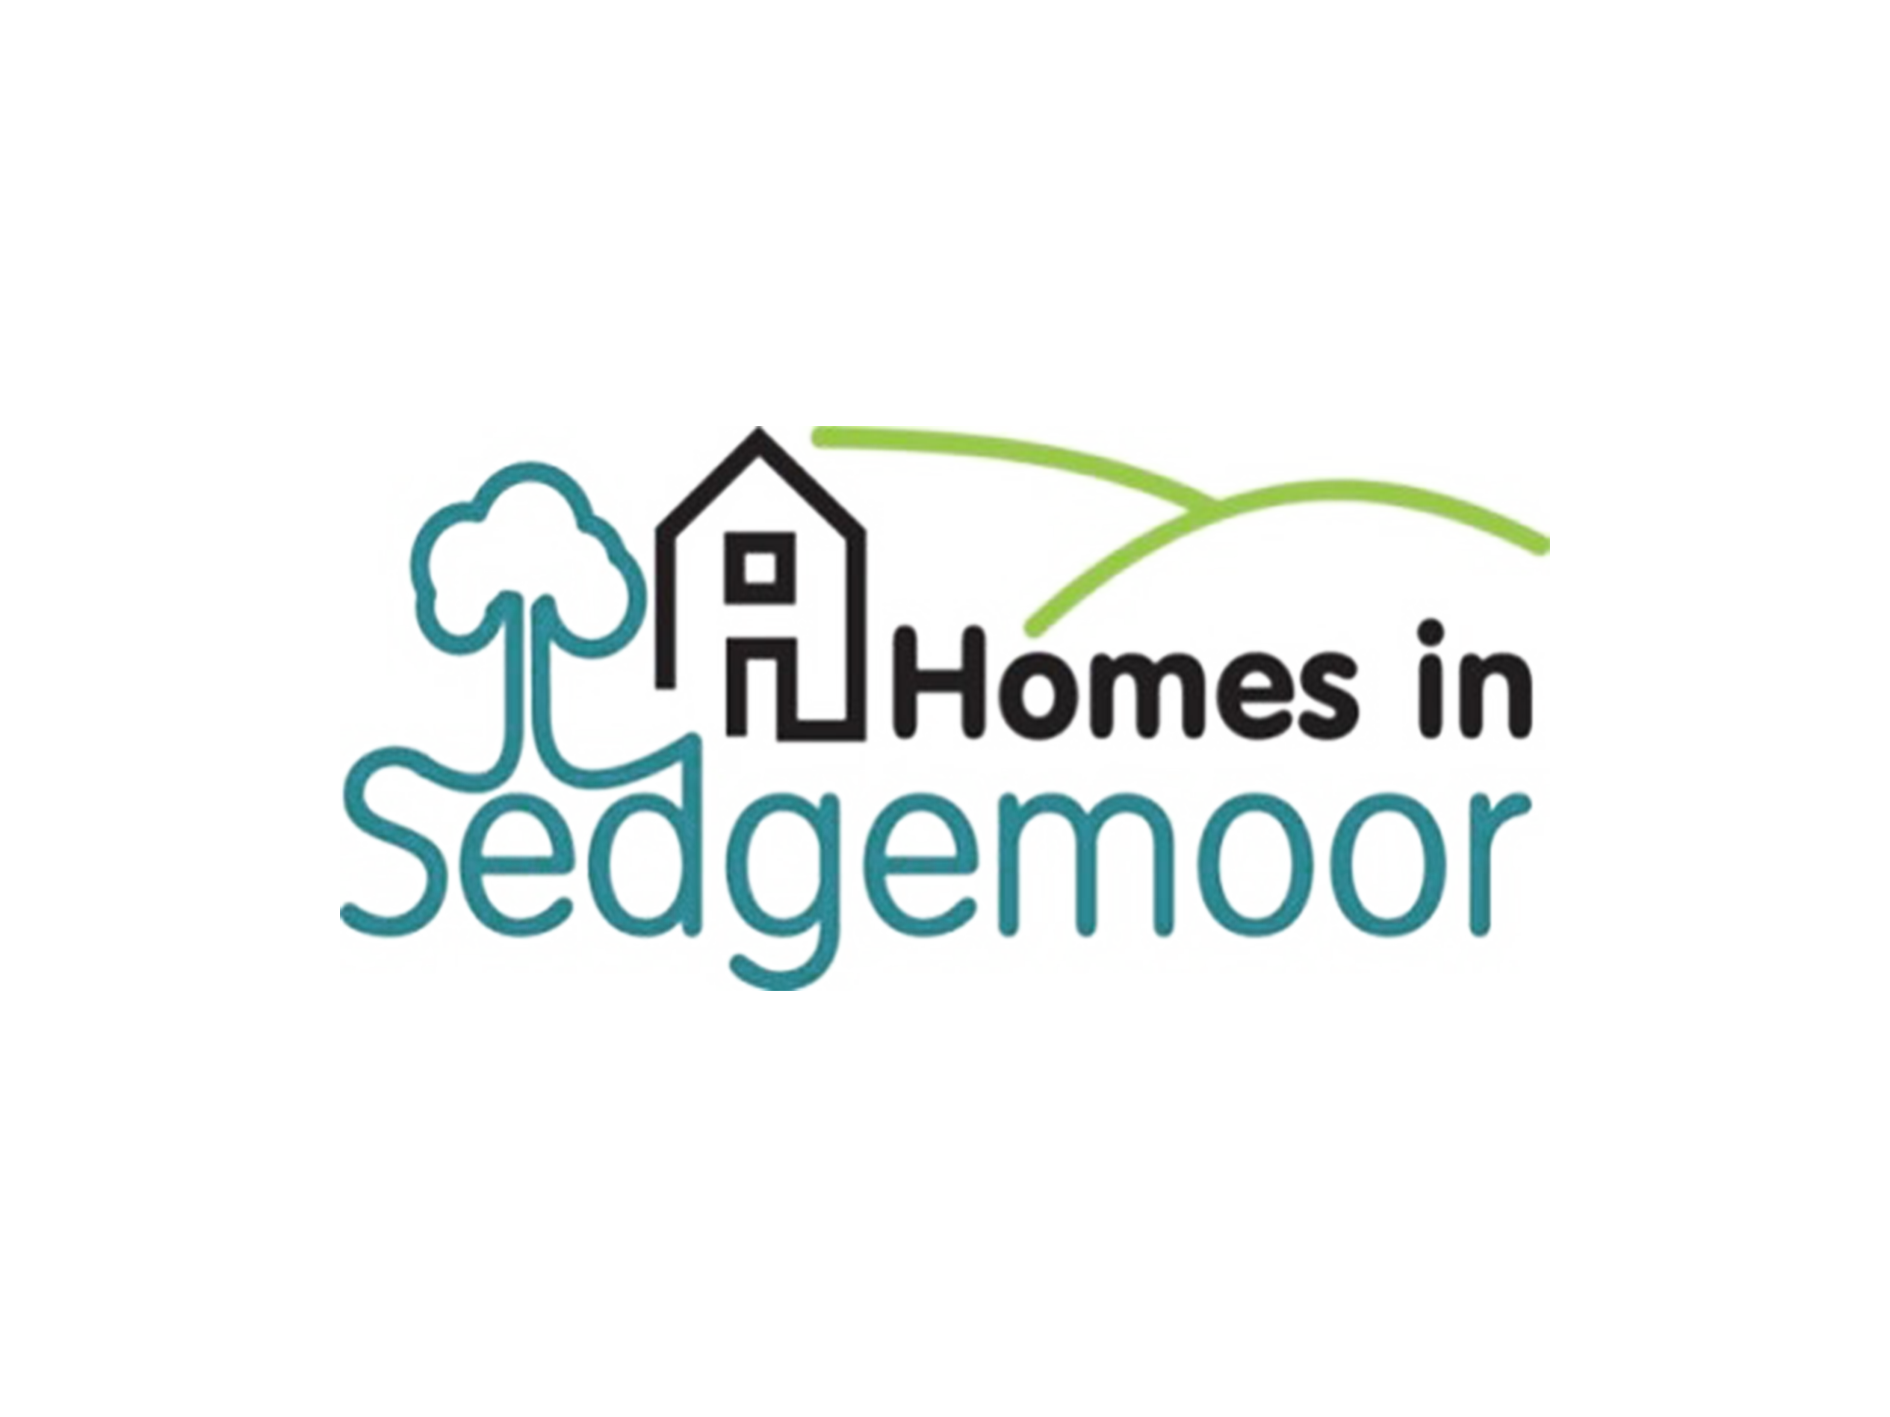 Homes in Sedgemoor logo